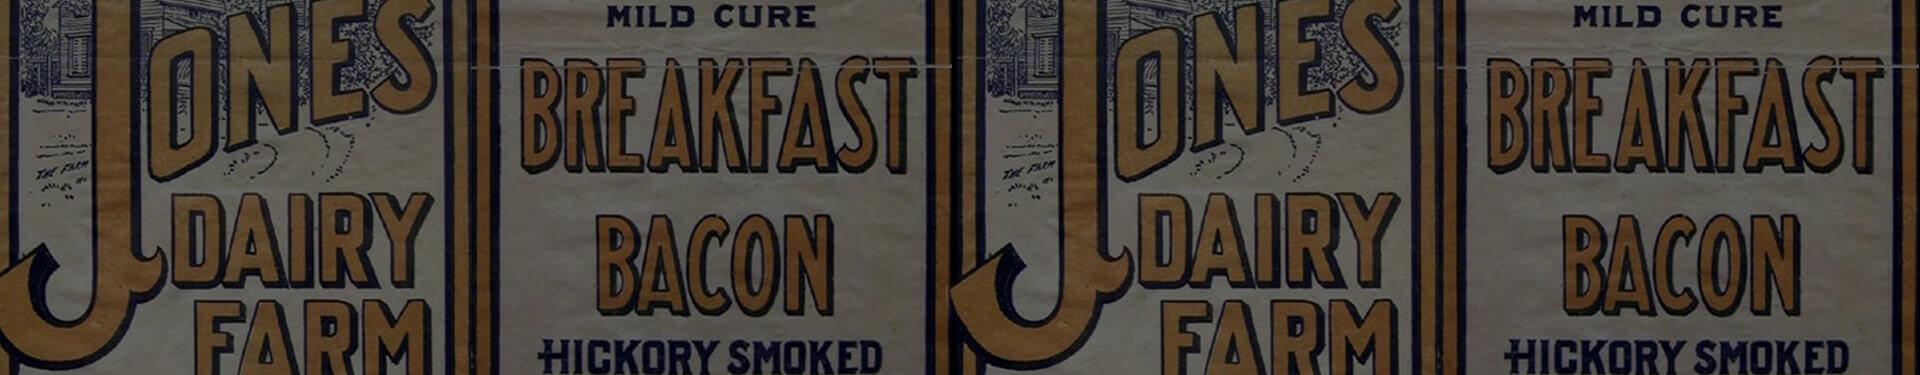 Jones Dairy Farm Historical Packaging